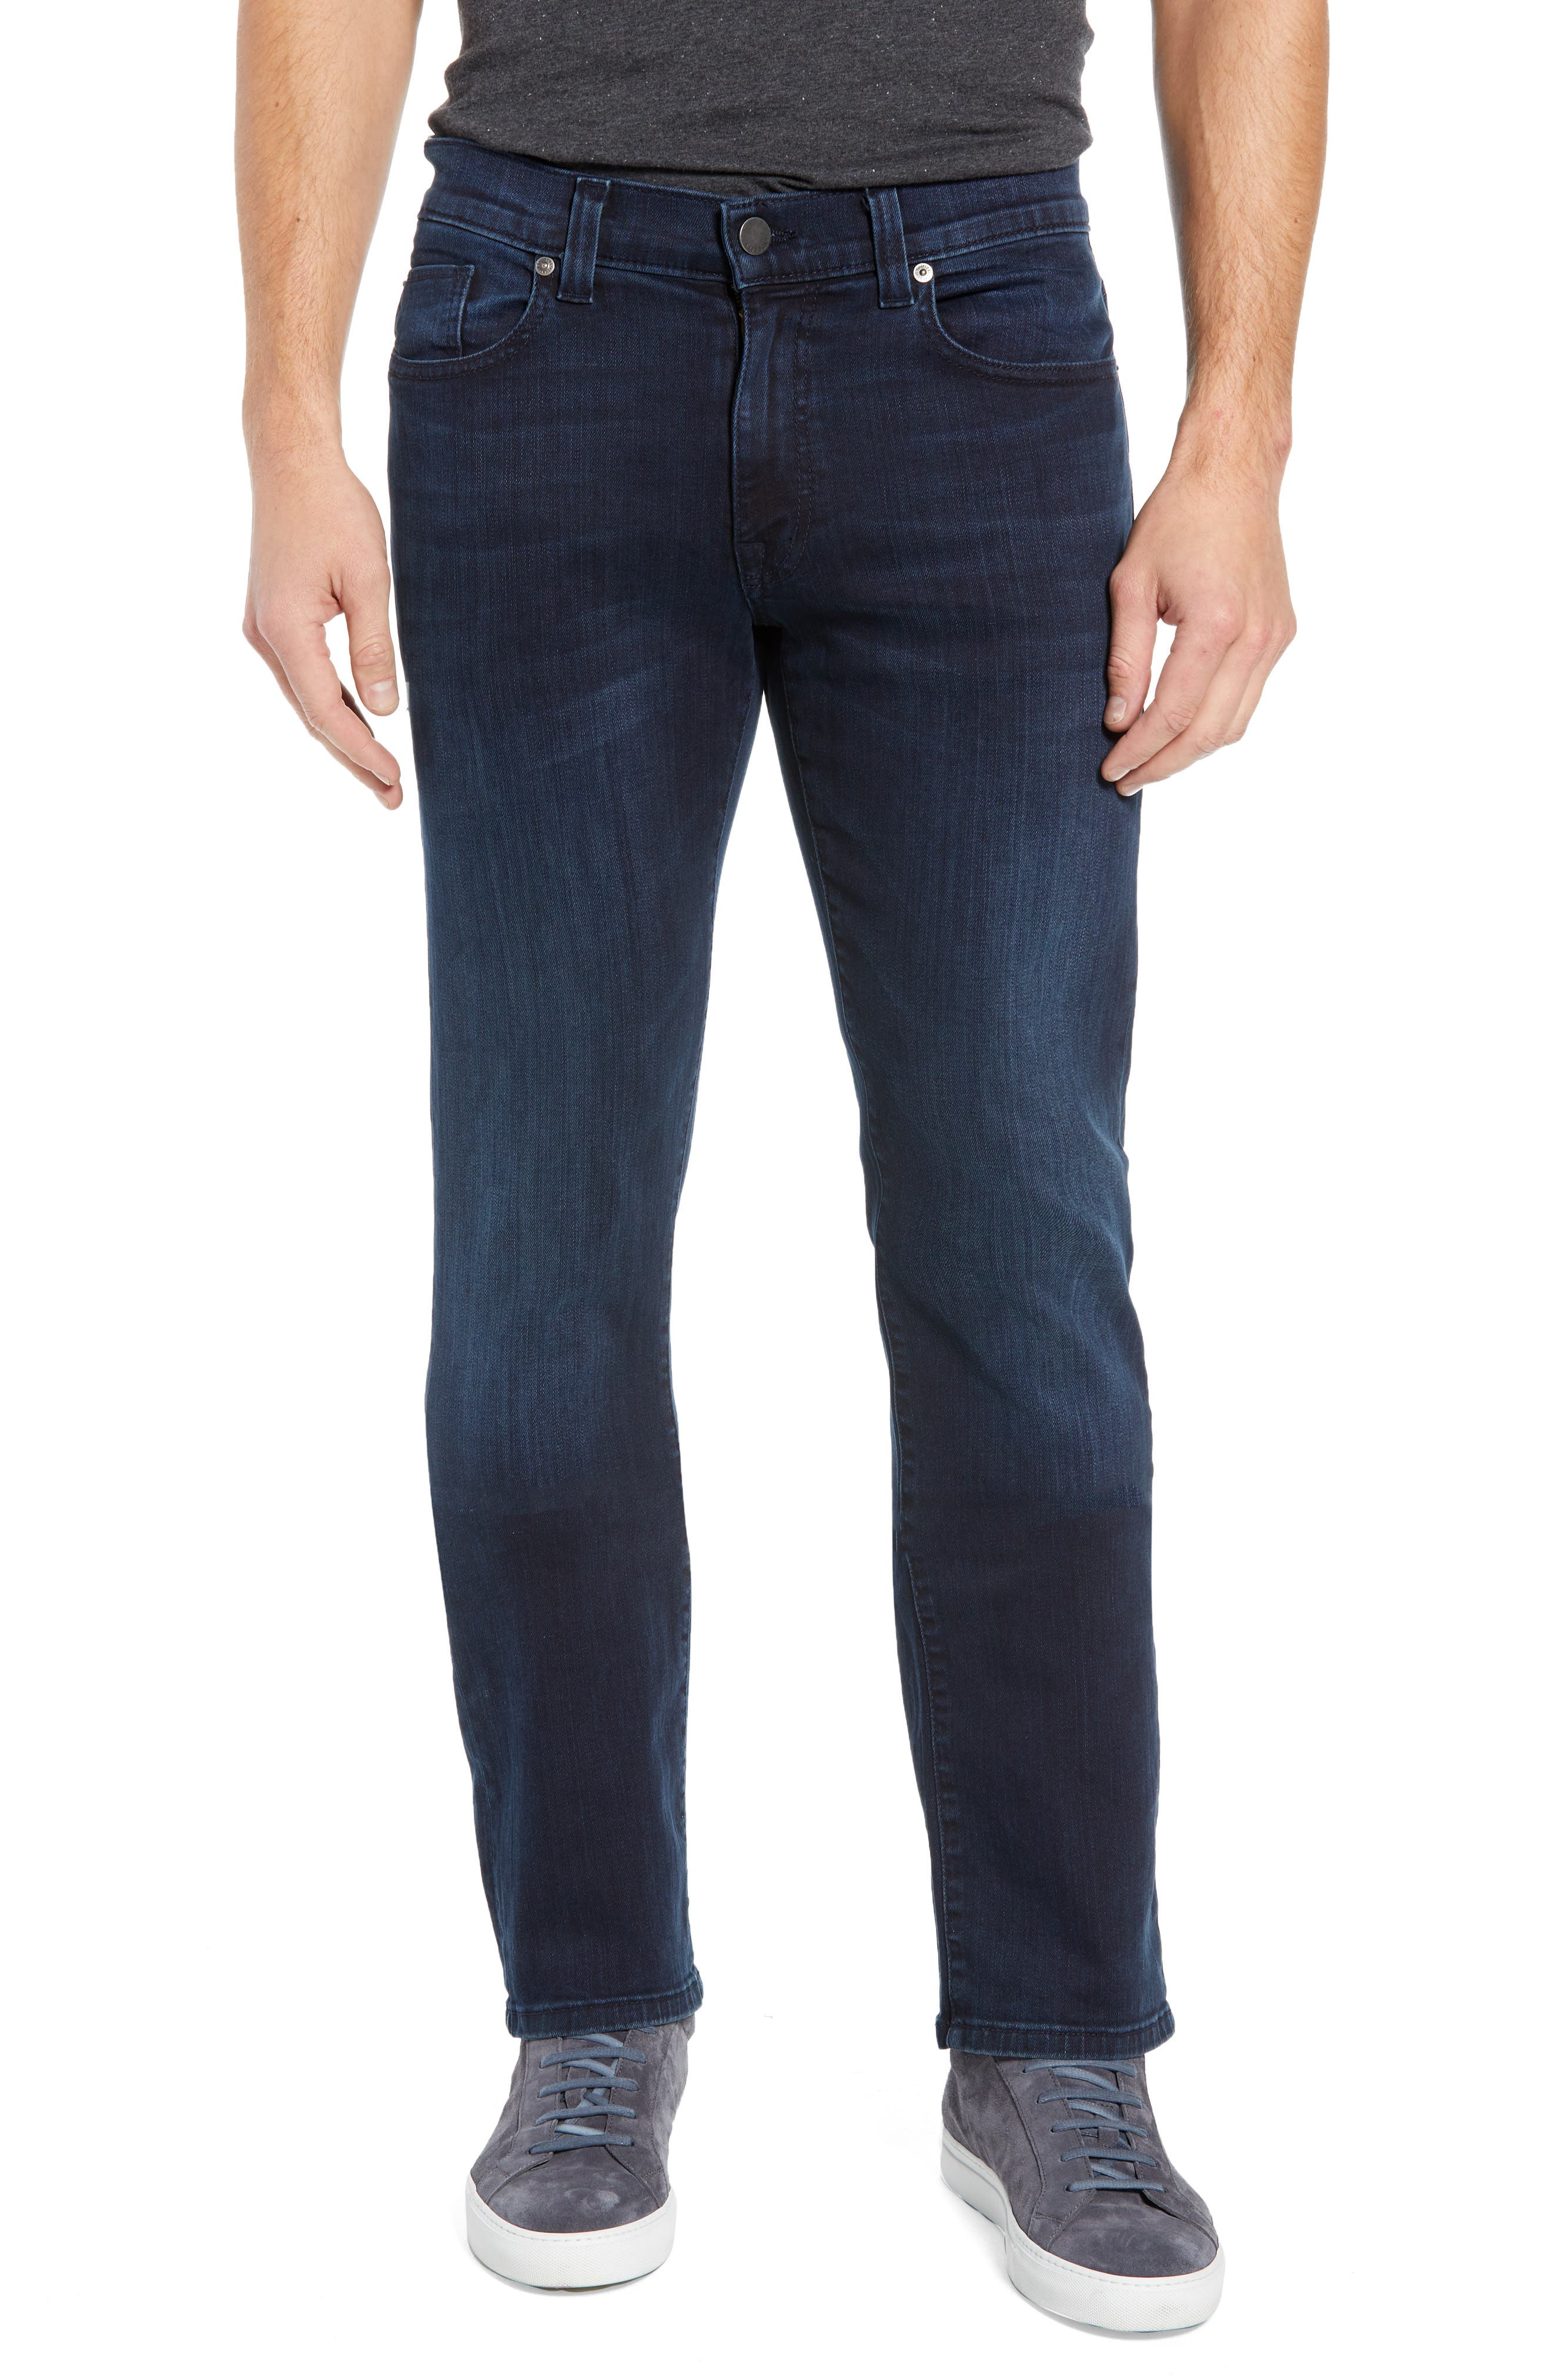 Impala Straight Leg Jeans,                             Main thumbnail 1, color,                             GENESIS